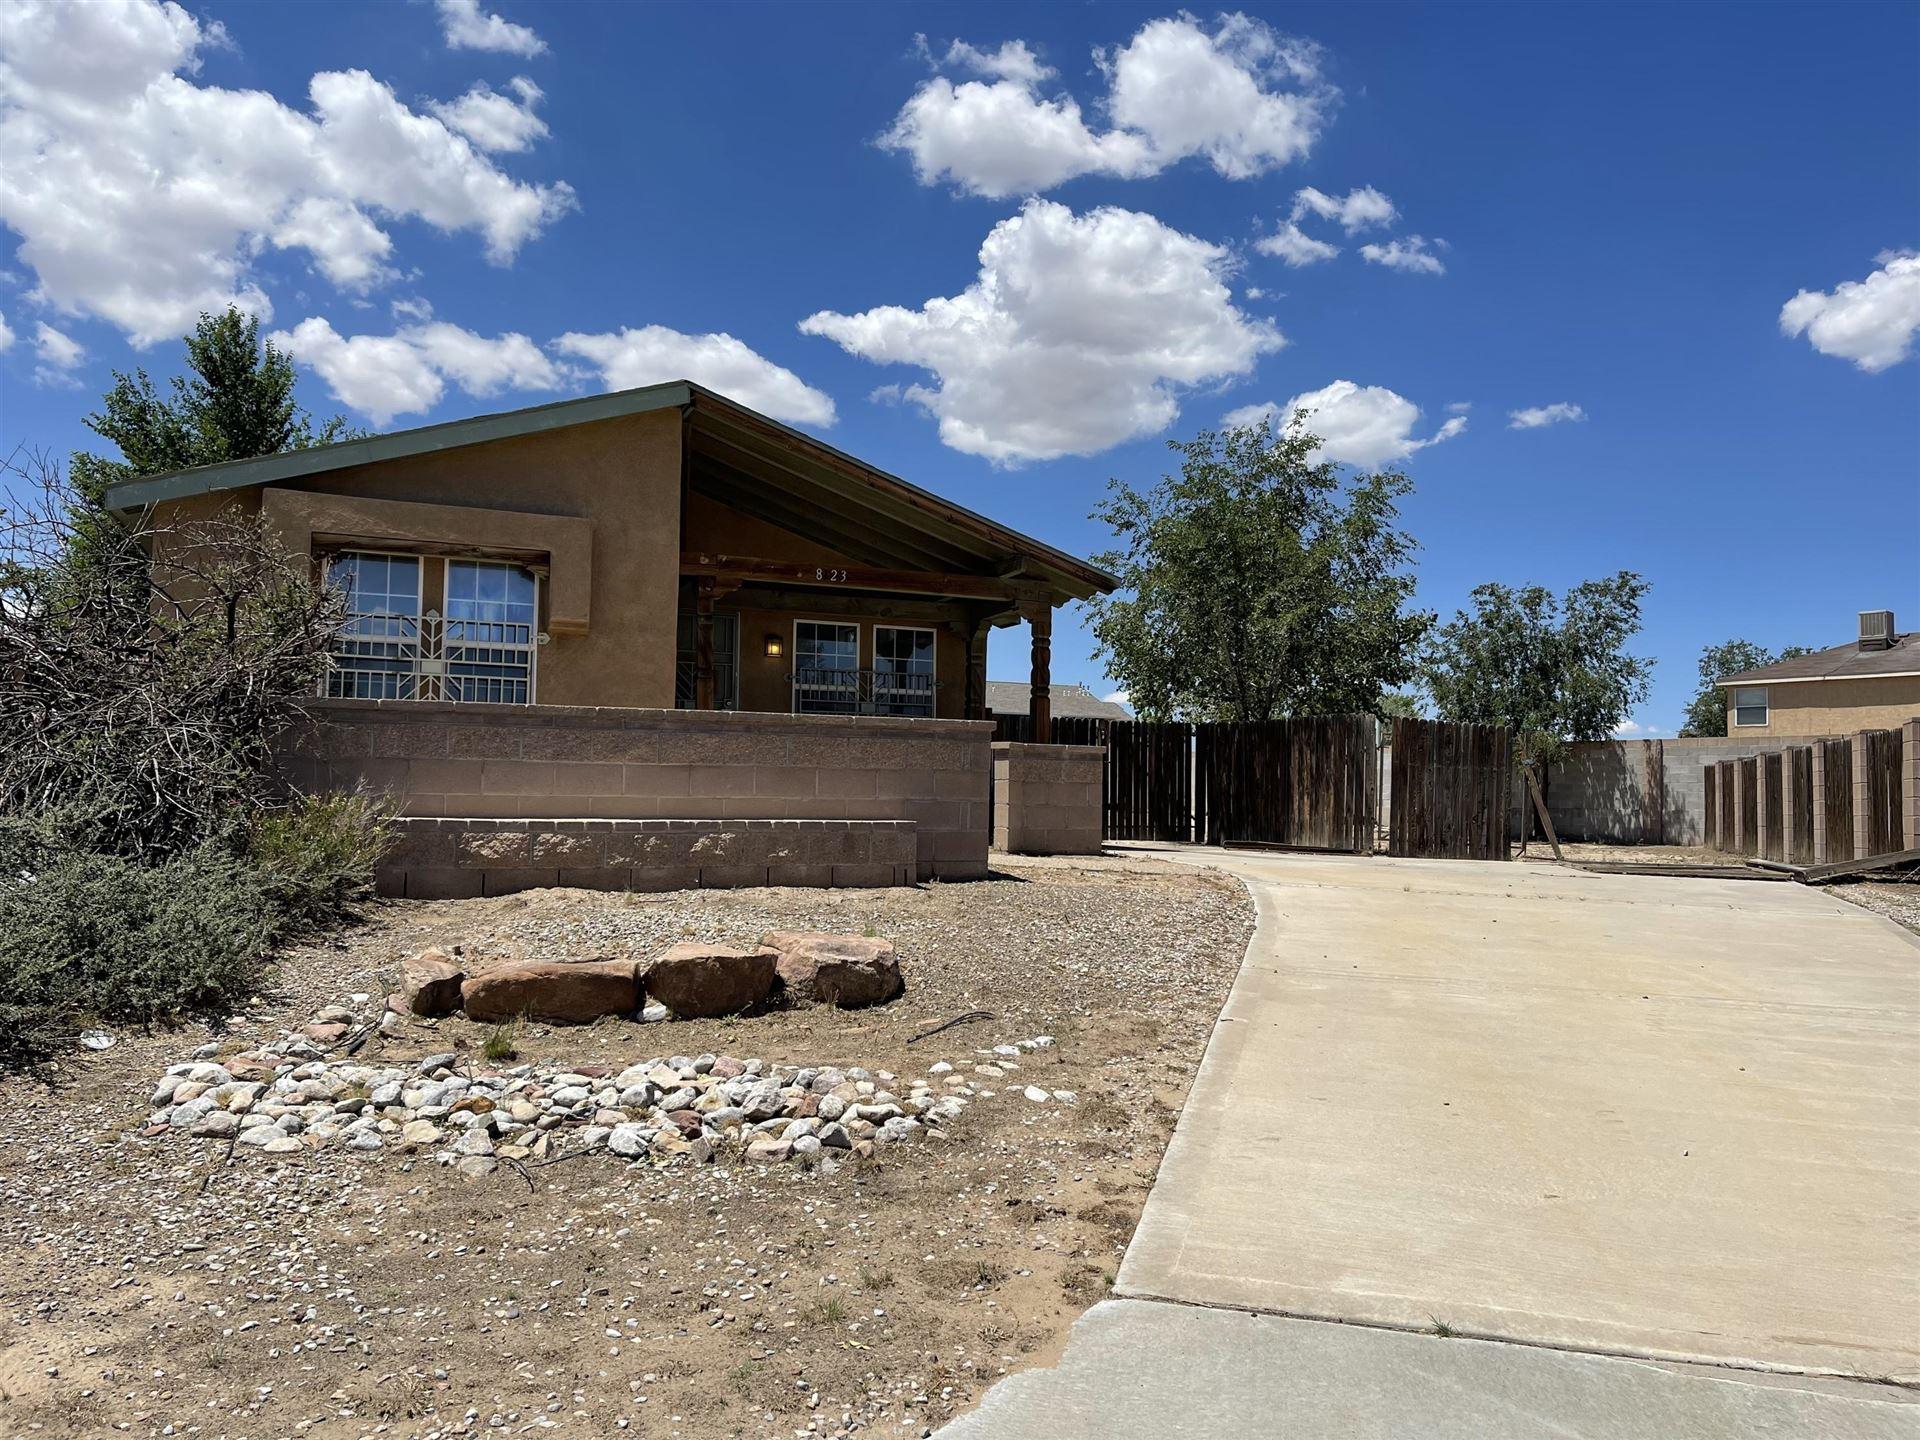 8123 GEM POINTE Road SW, Albuquerque, NM 87121 - #: 997764